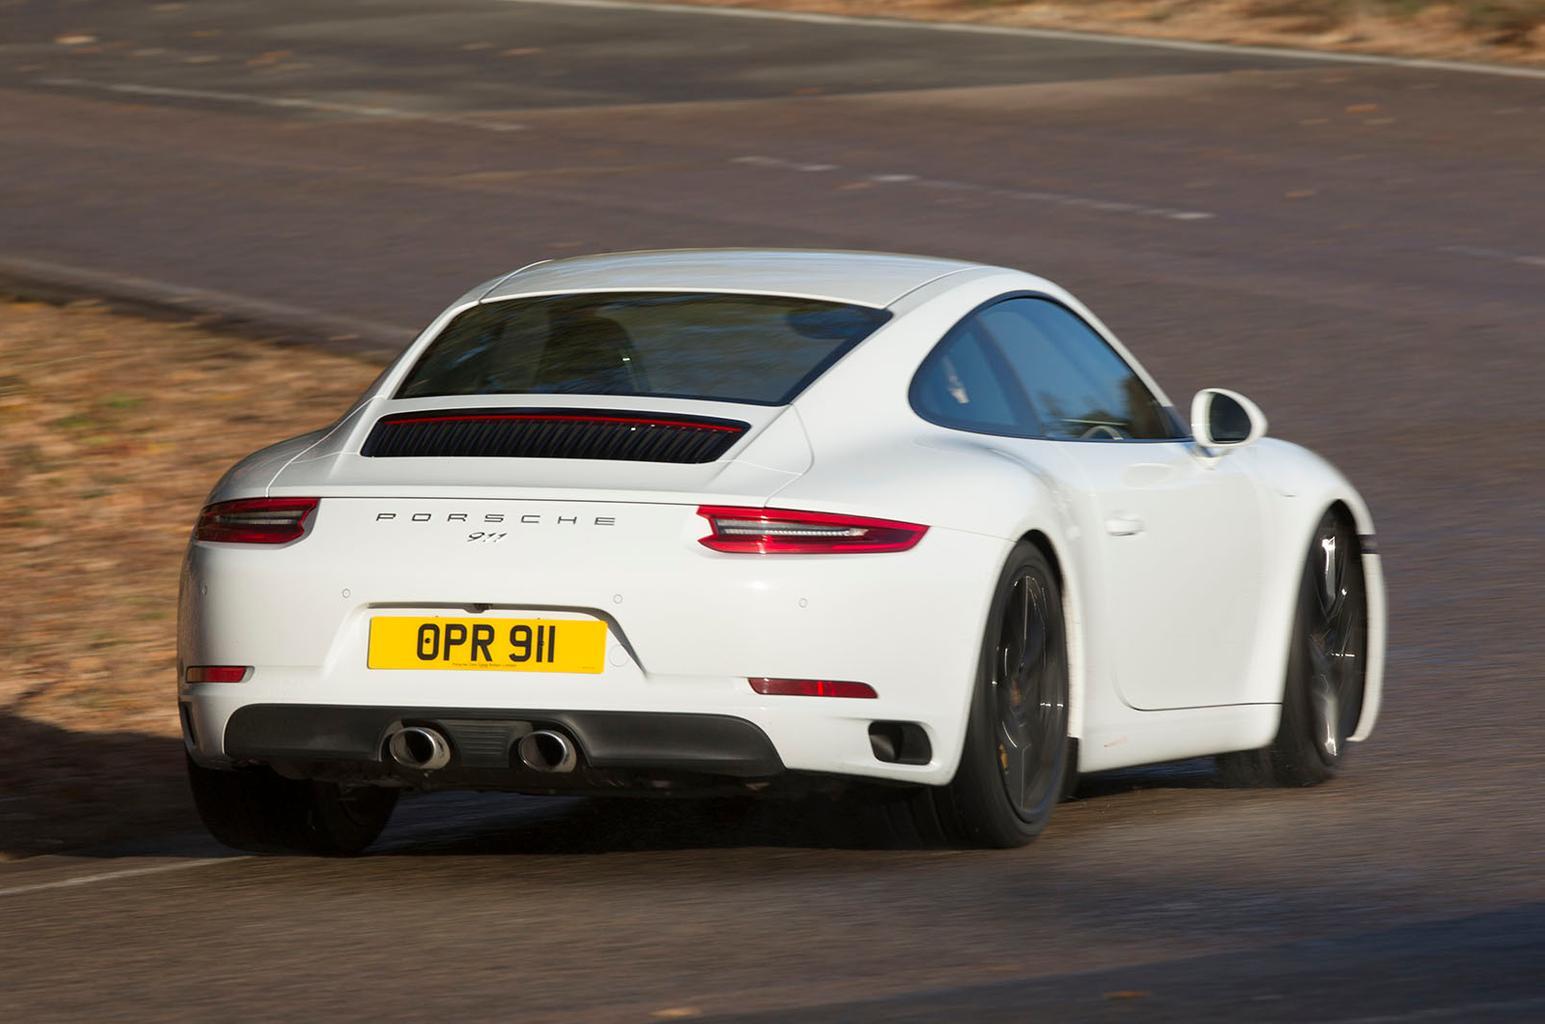 Used test: Jaguar F-Type vs Porsche 911